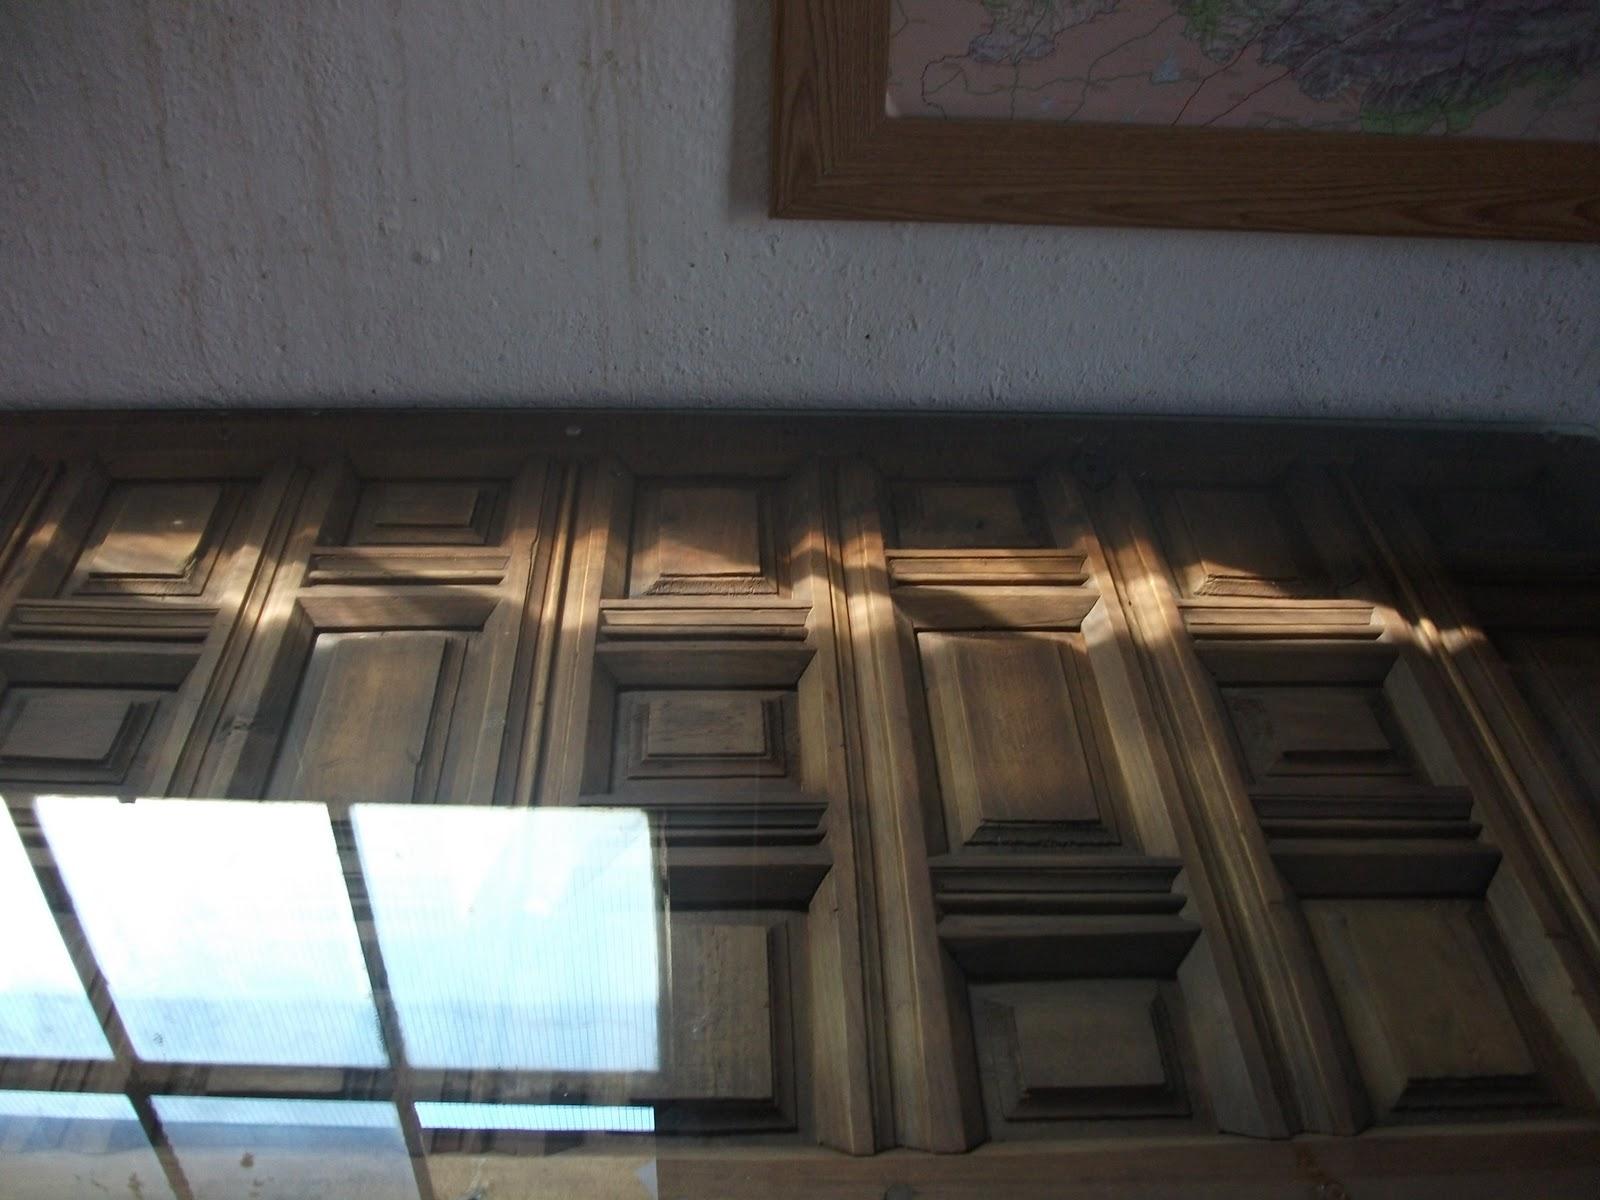 Carpinteria de madera luis aliste mesa for Carpinteria de puertas de madera